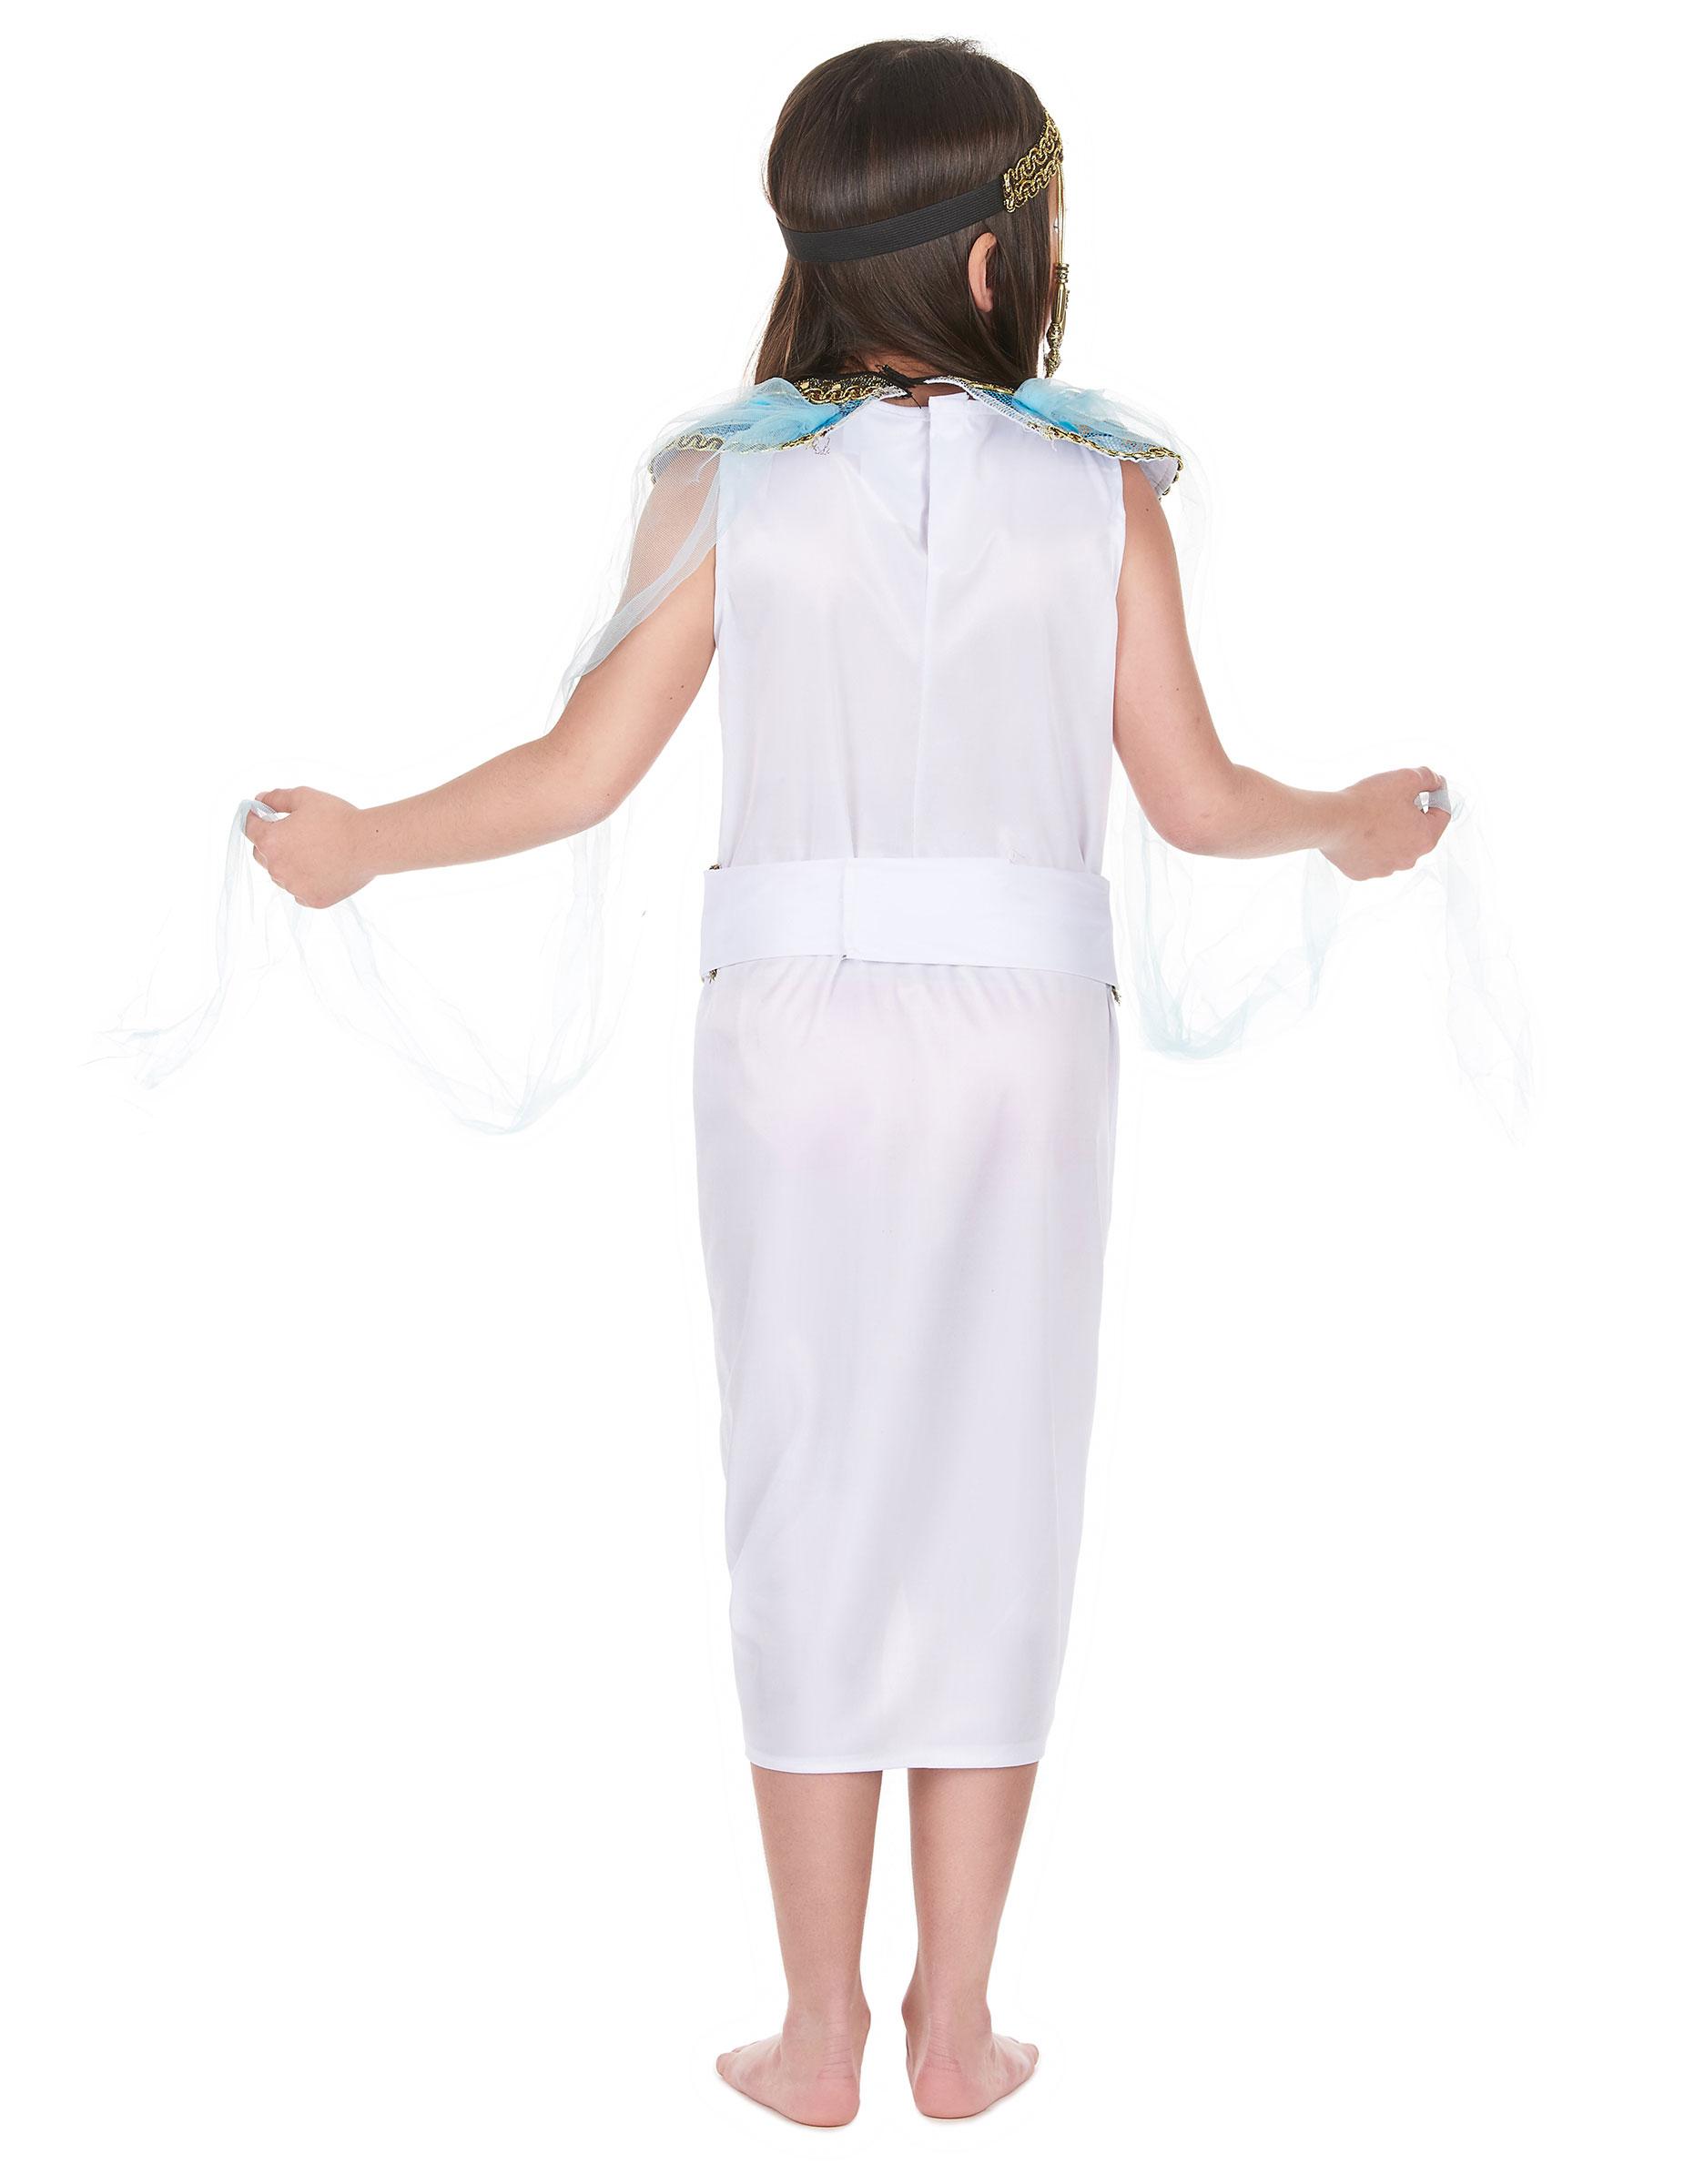 Kleopatra Kinder Kostum Blau Weiss Gold Gunstige Faschings Kostume